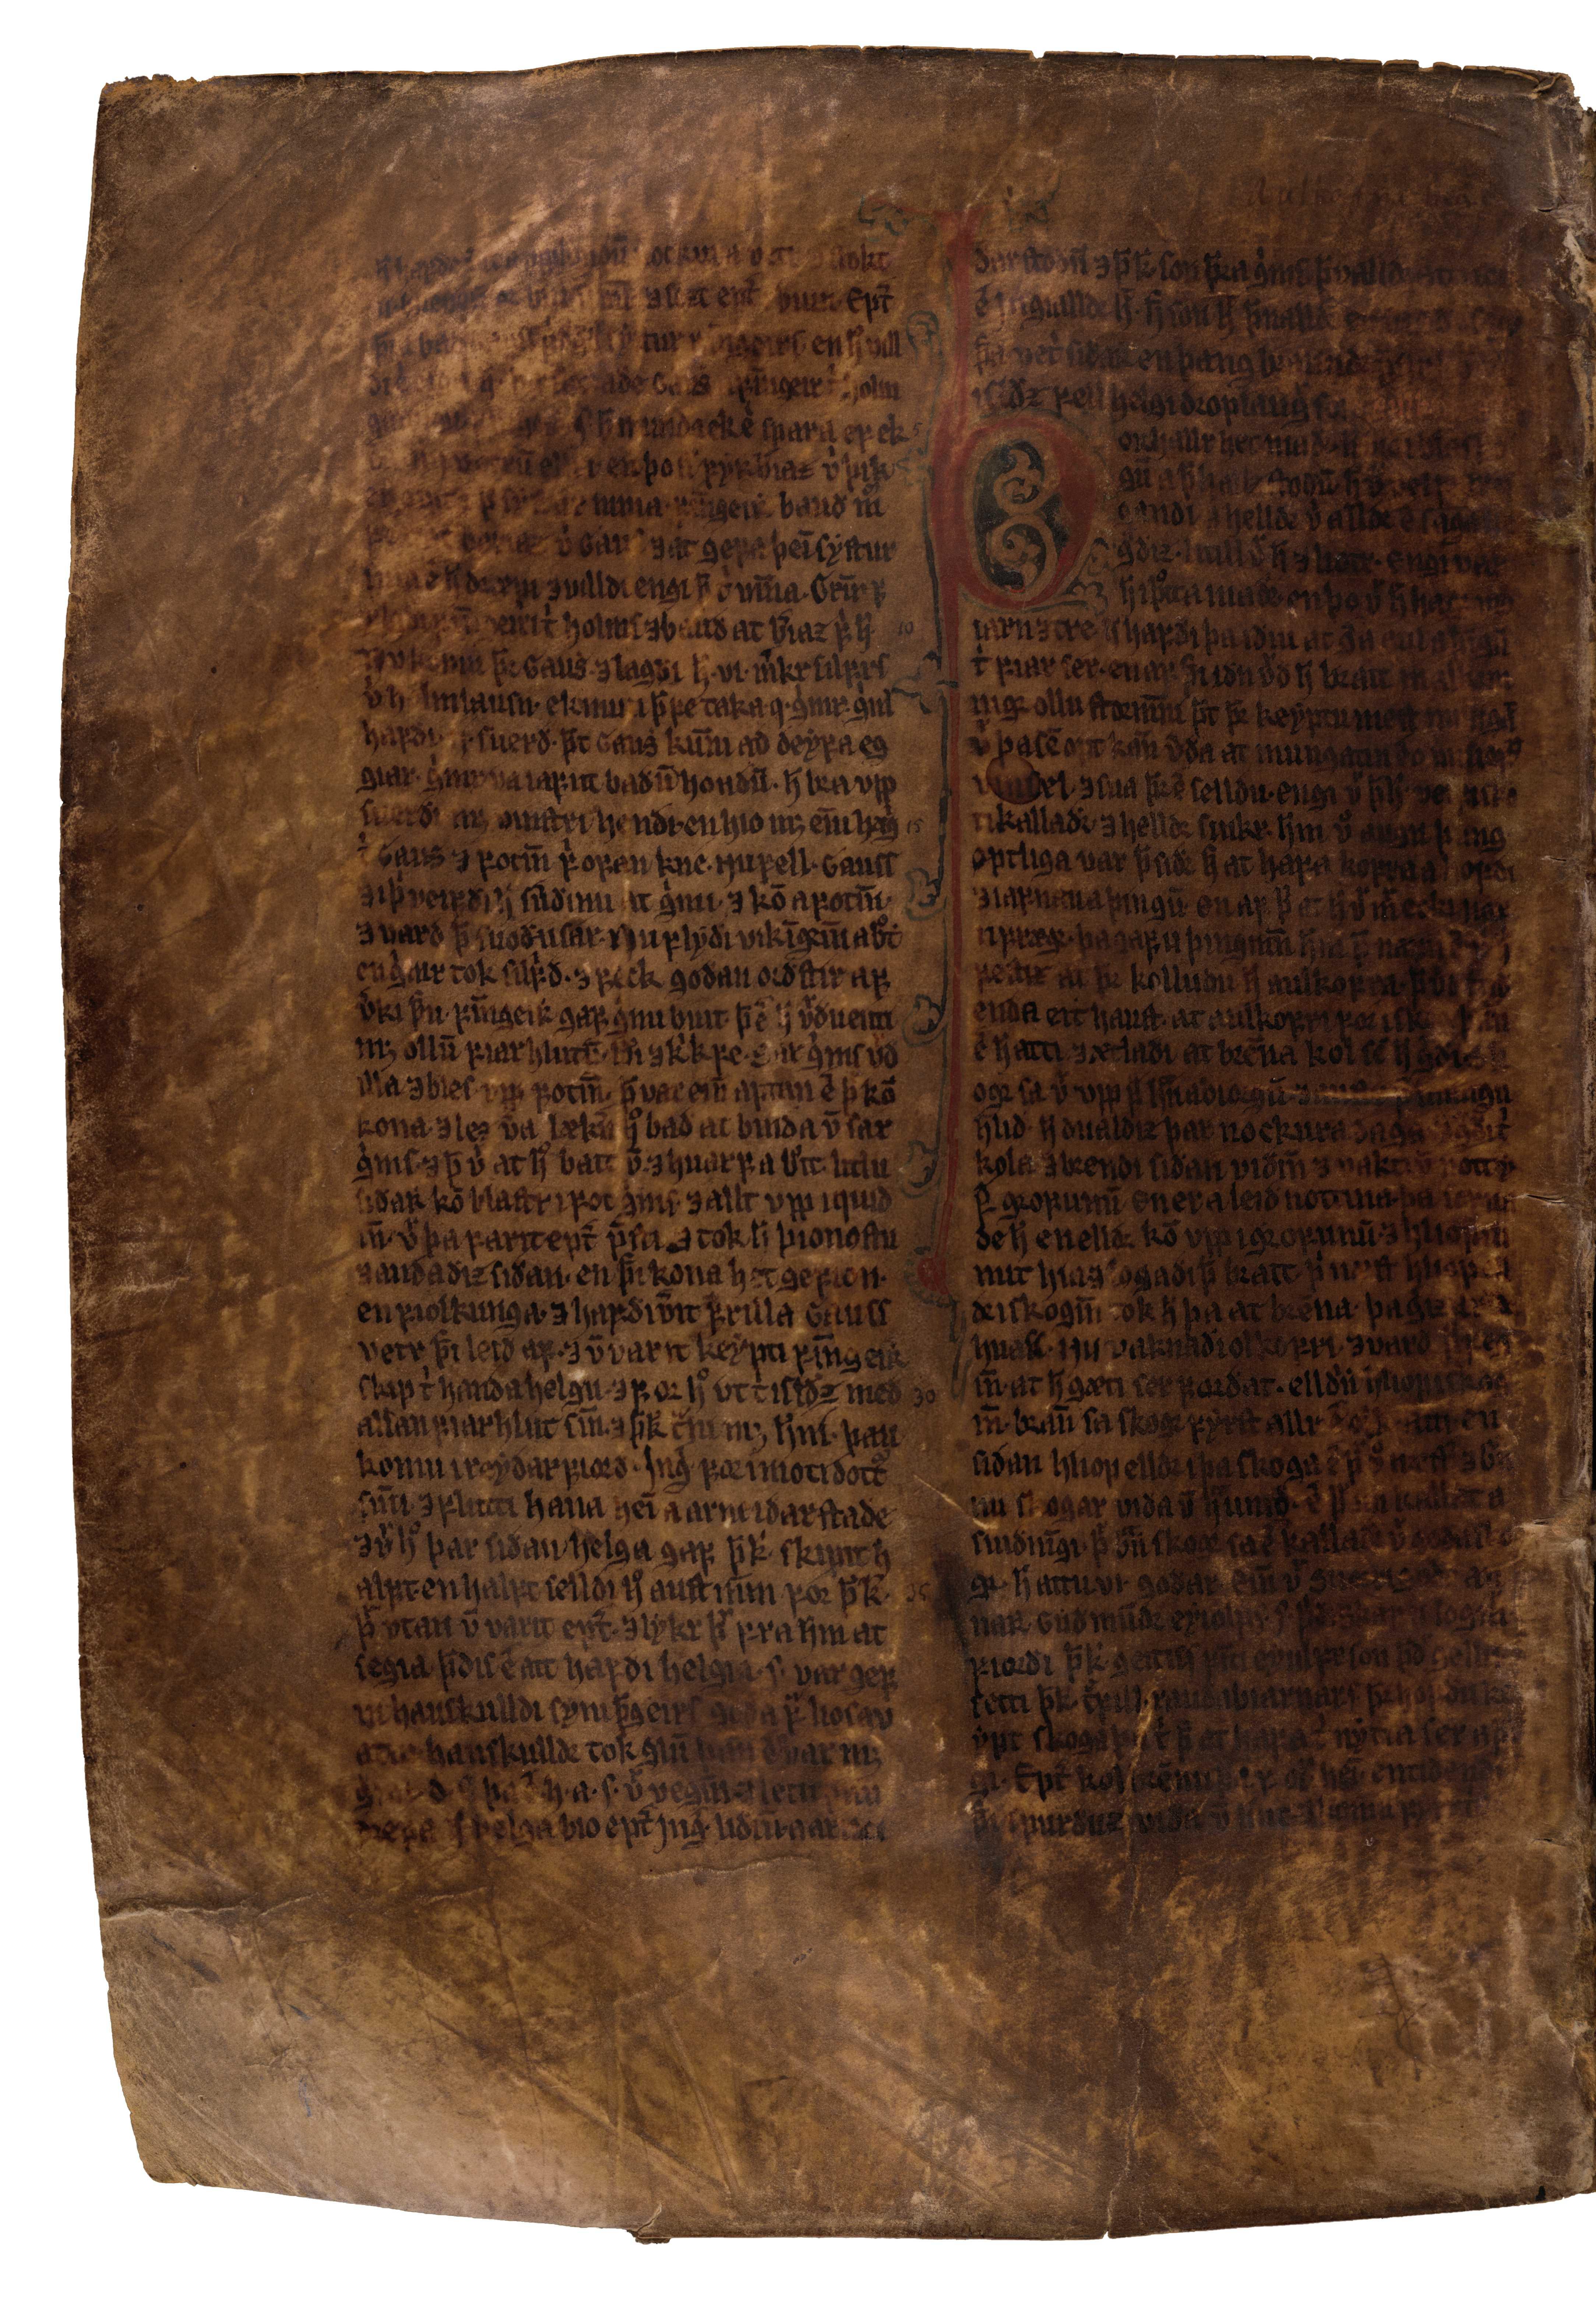 AM 132 fol - 147v